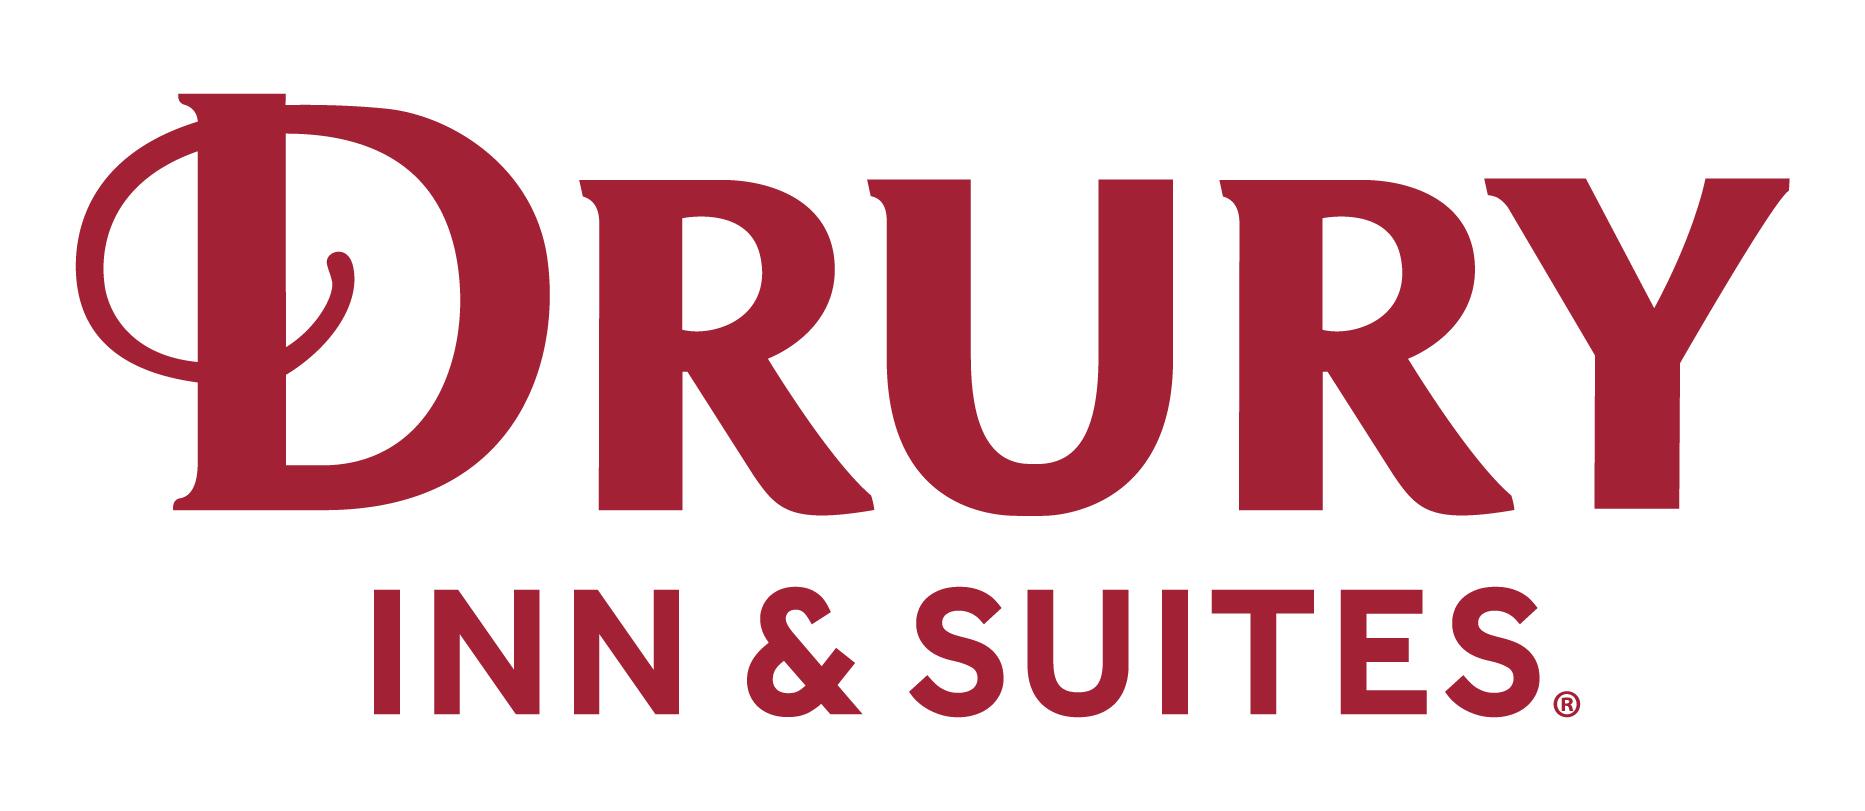 https://secureservercdn.net/198.71.233.179/mjf.381.myftpupload.com/wp-content/uploads/2021/06/Logo_Drury-Inn-_-Suites-Stacked_BOTTOM.jpg